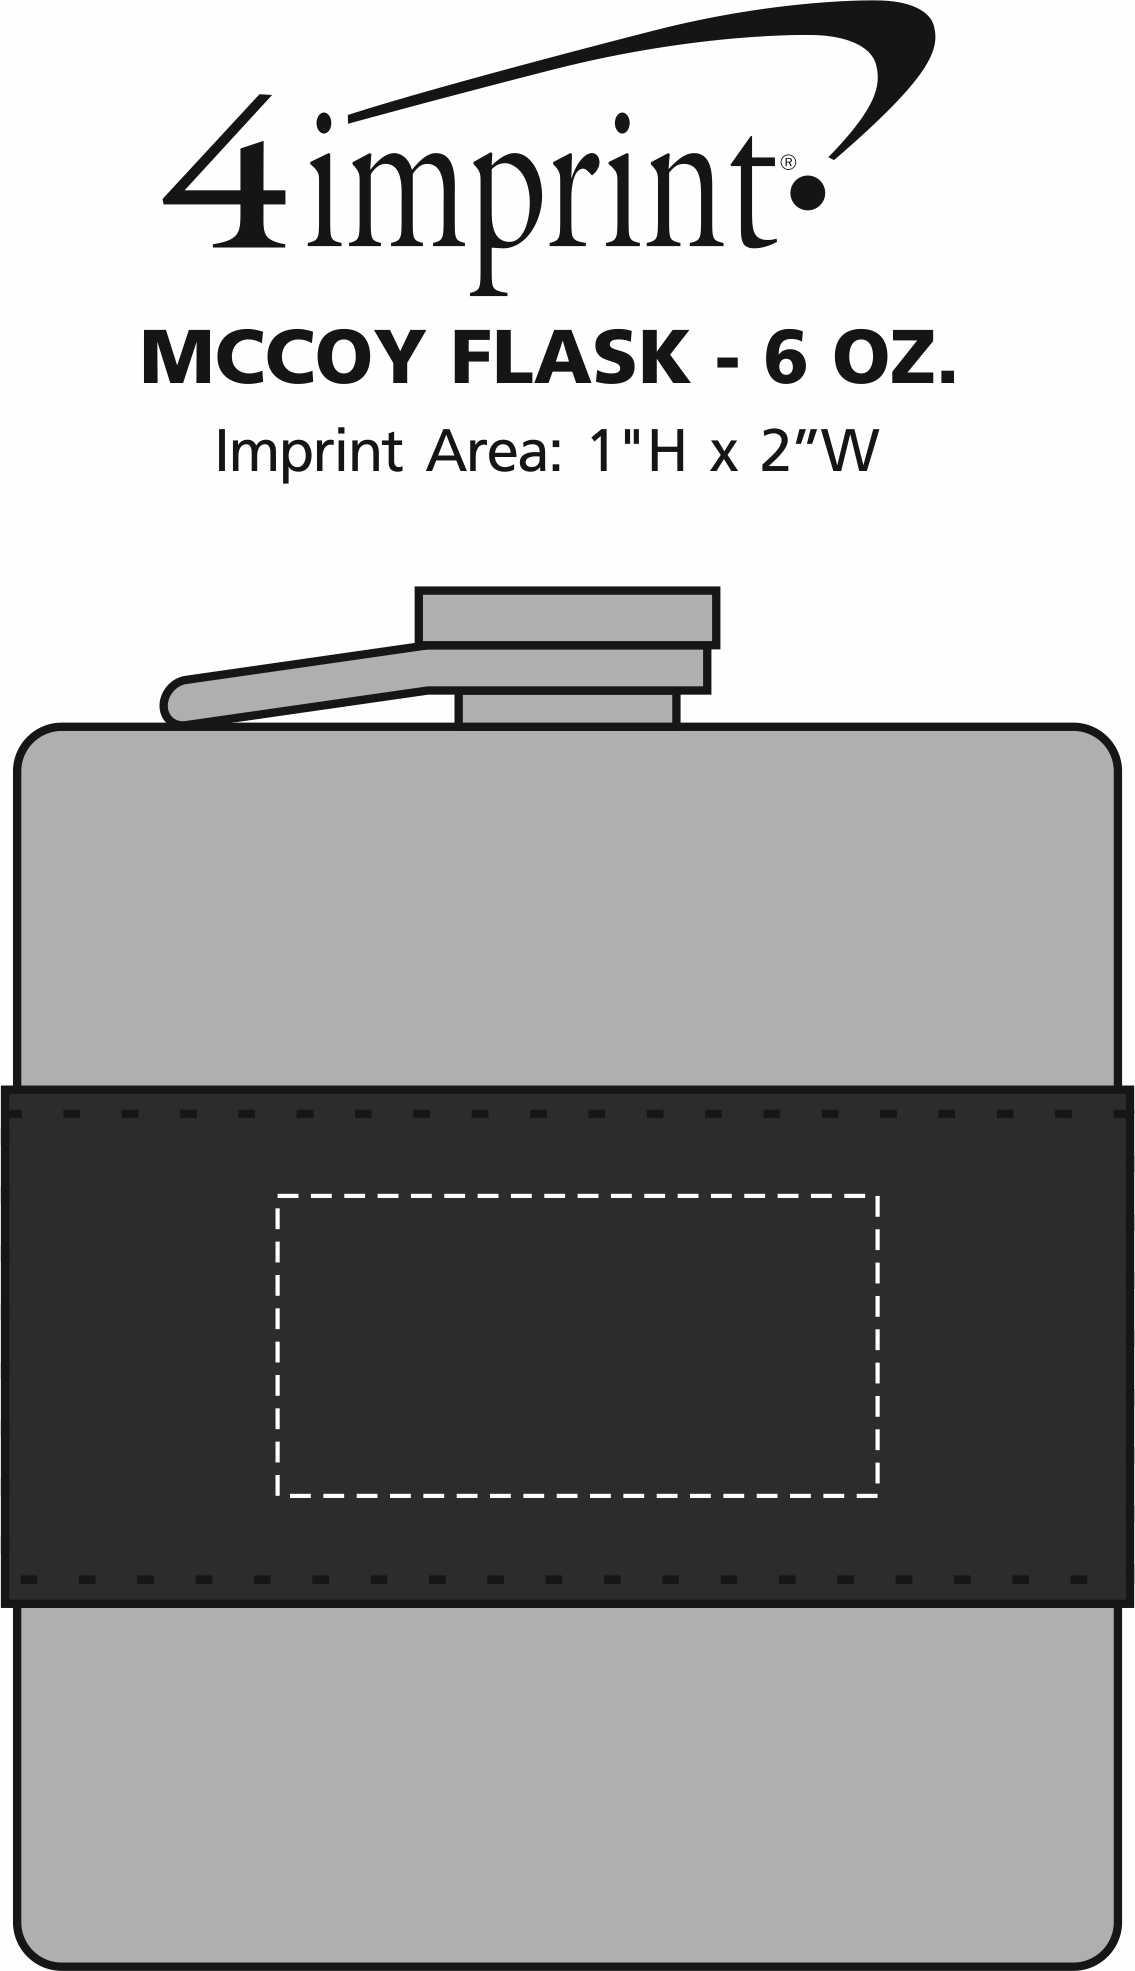 Imprint Area of McCoy Flask - 6 oz.